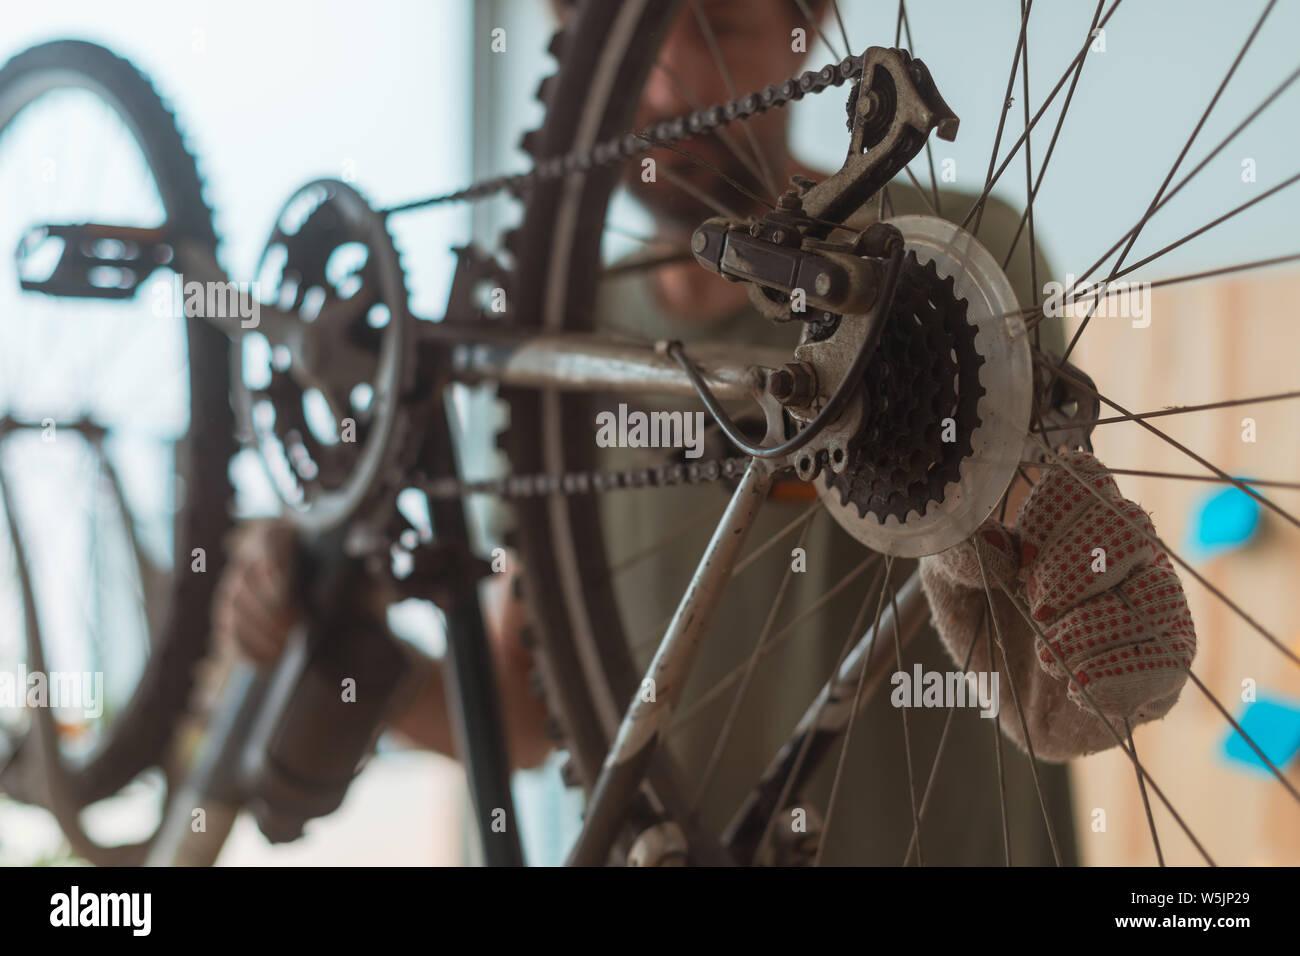 Man repairing old hardtail mountain bike in workshop, selective focus Stock Photo